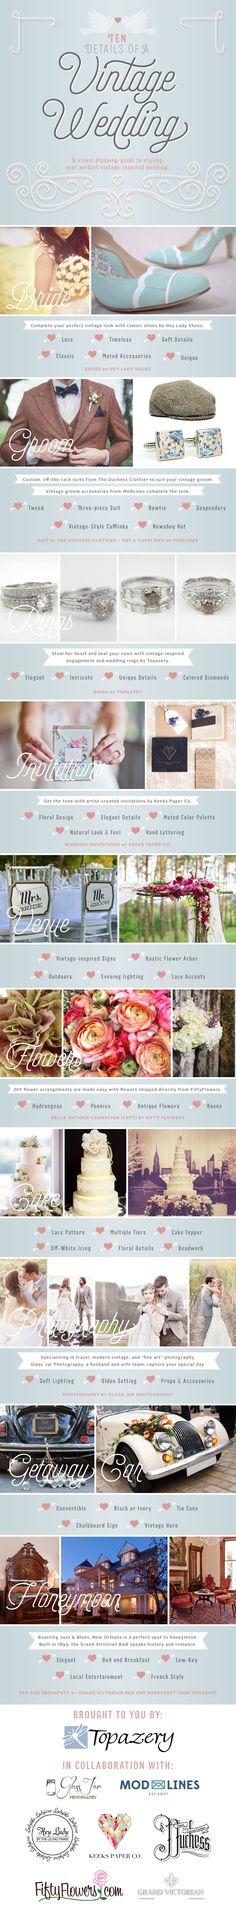 Ten Details of a Vintage Wedding | Topazery